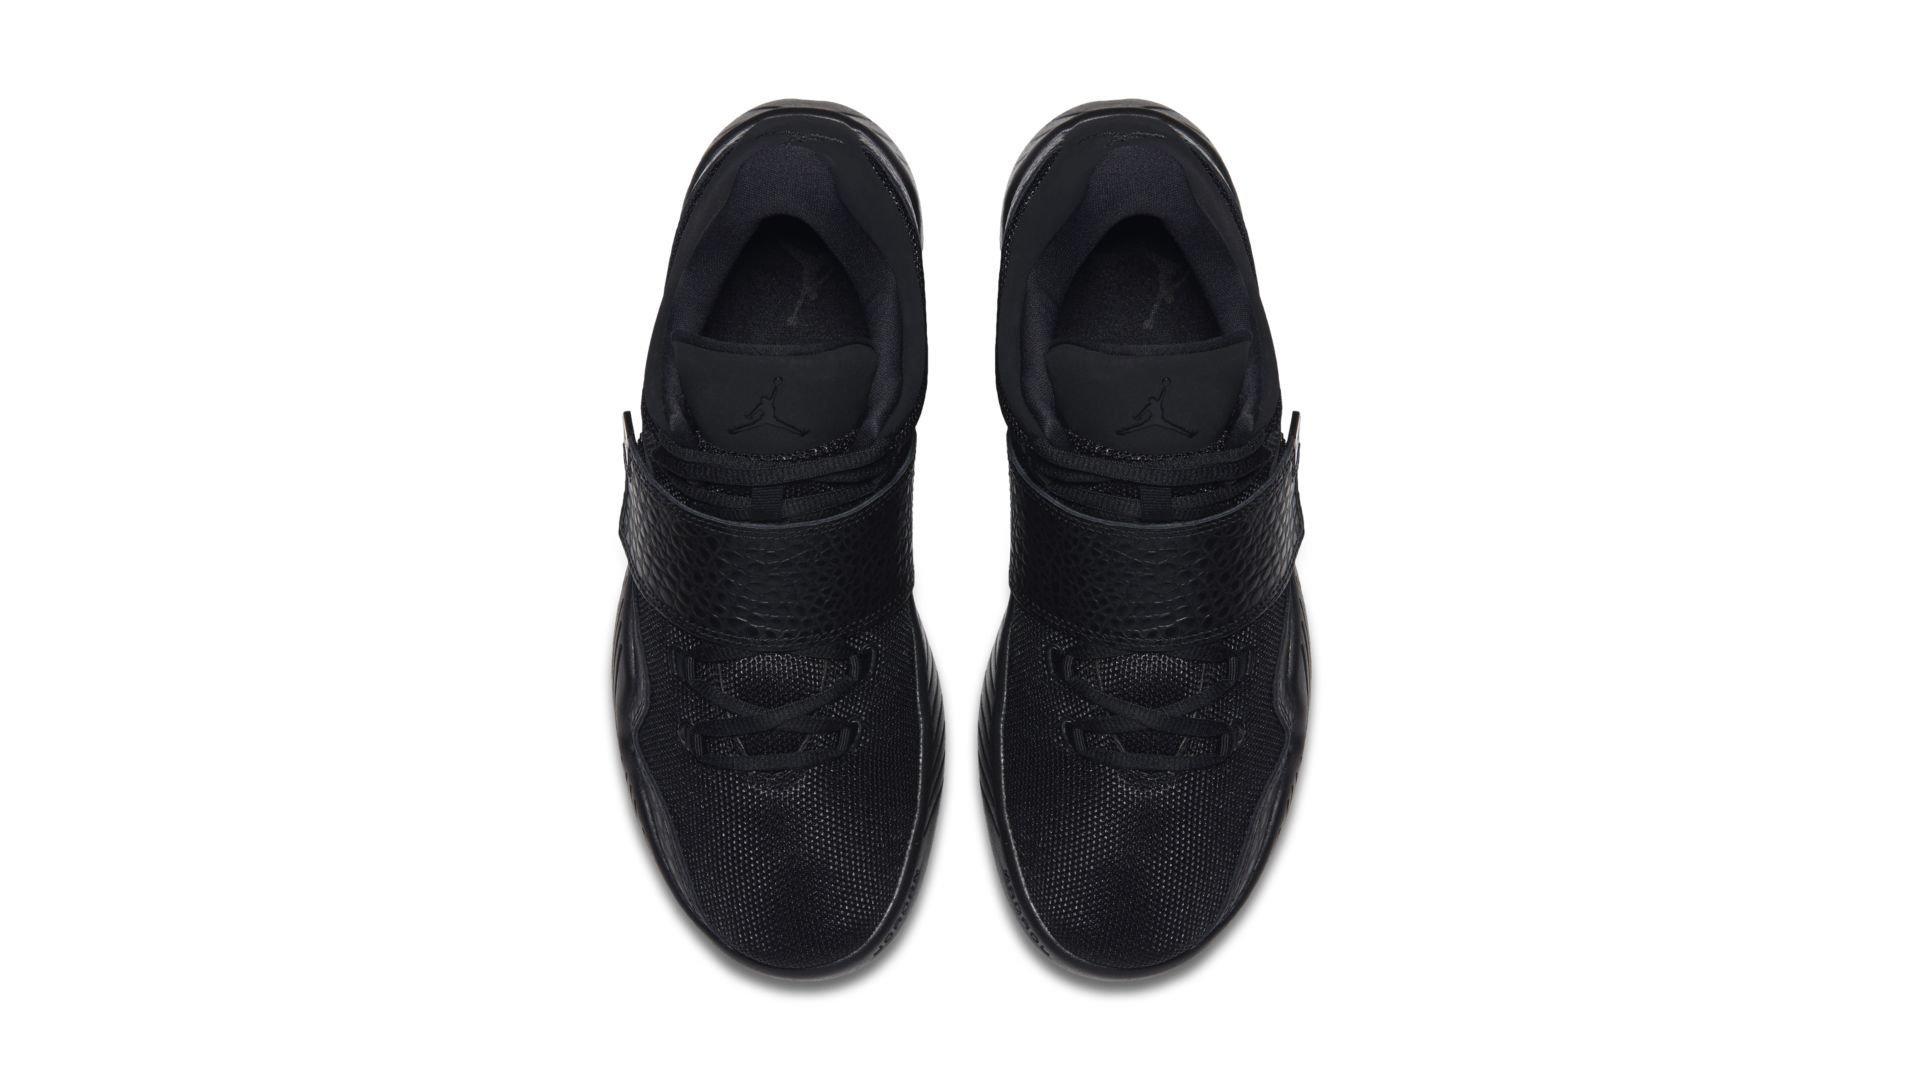 Jordan J23 Triple Black (854557-001)